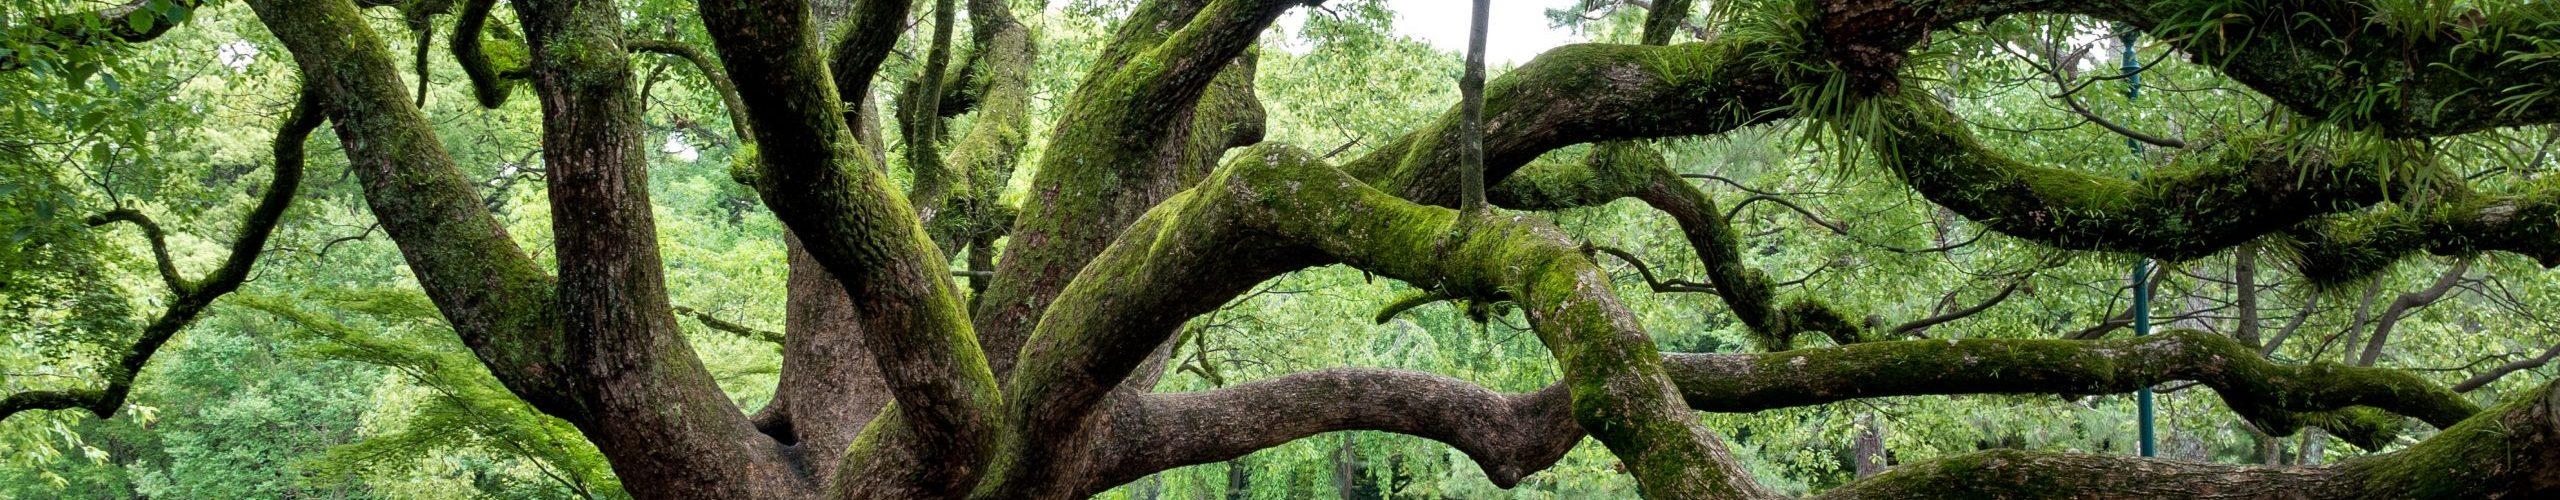 tree-1236626